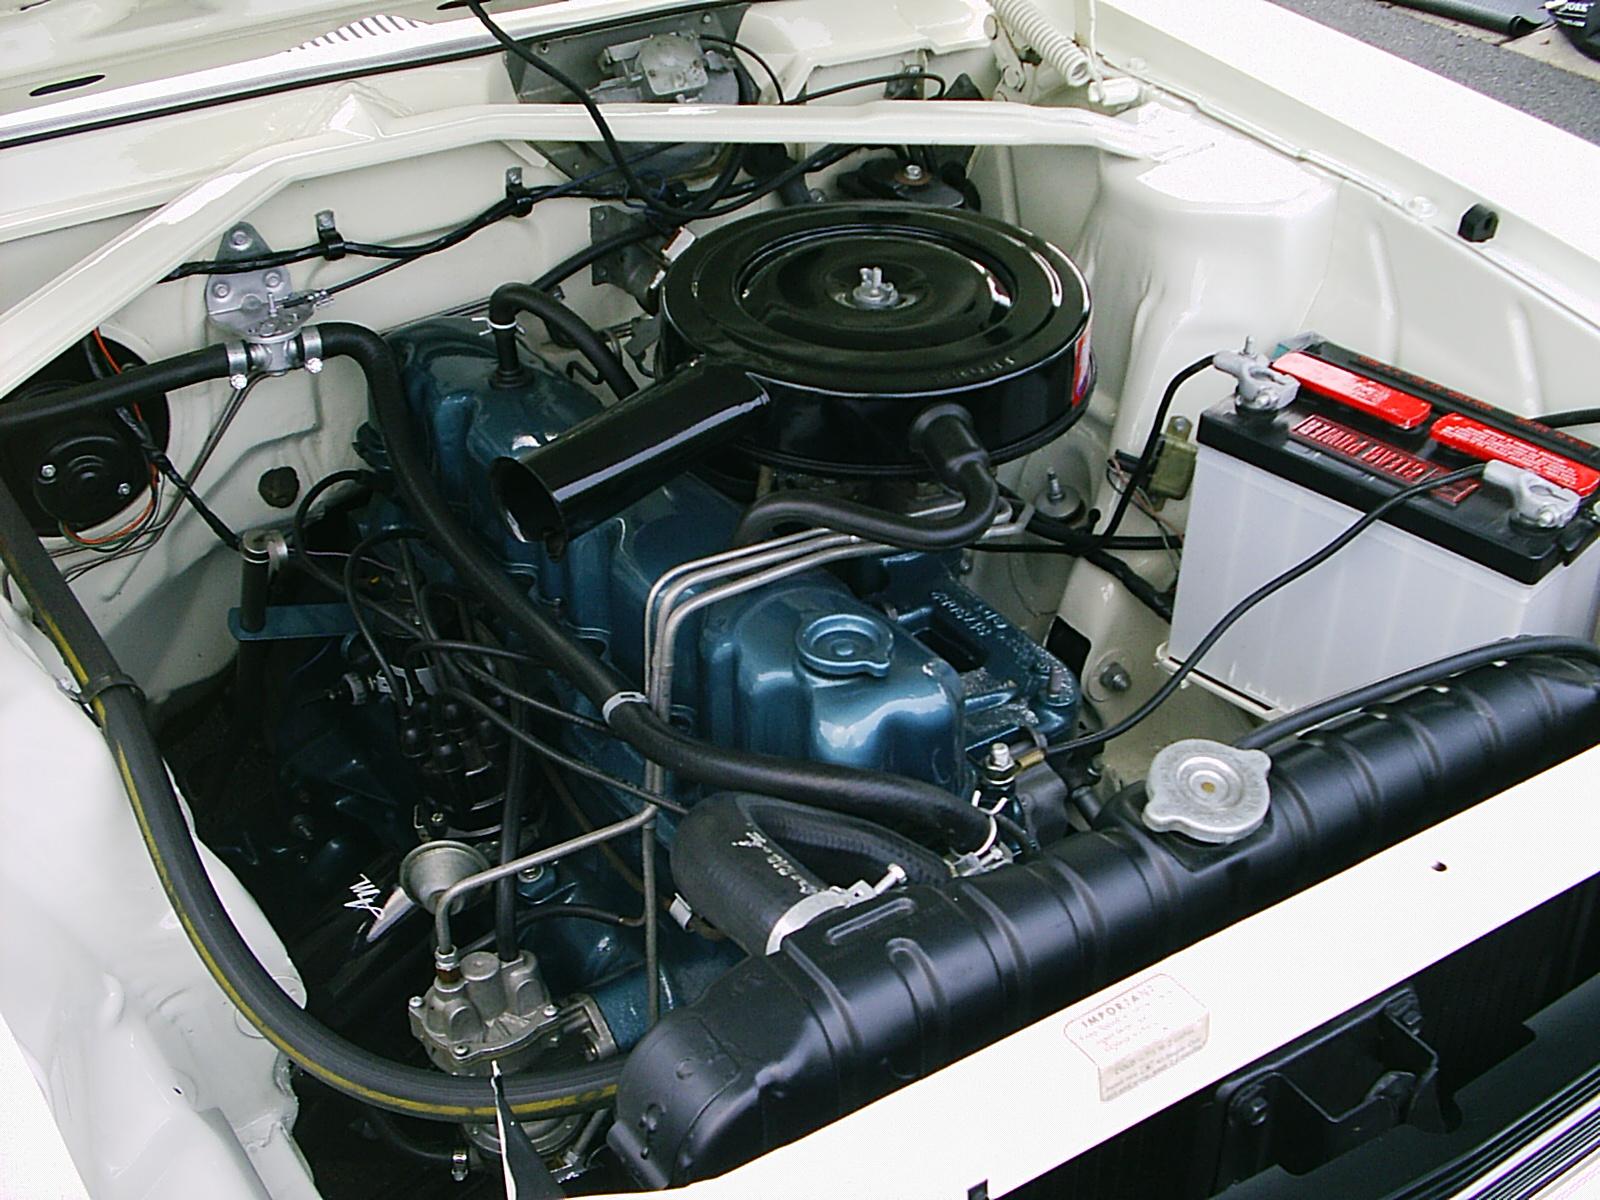 2012 2013 Hyundai Veloster Turbo Duraflex GT Racing Body Kit 5 Piece likewise Images in addition Watch likewise  further Saab 99 900 Turbo Built Trolls Trollhattan. on 1976 saab turbo